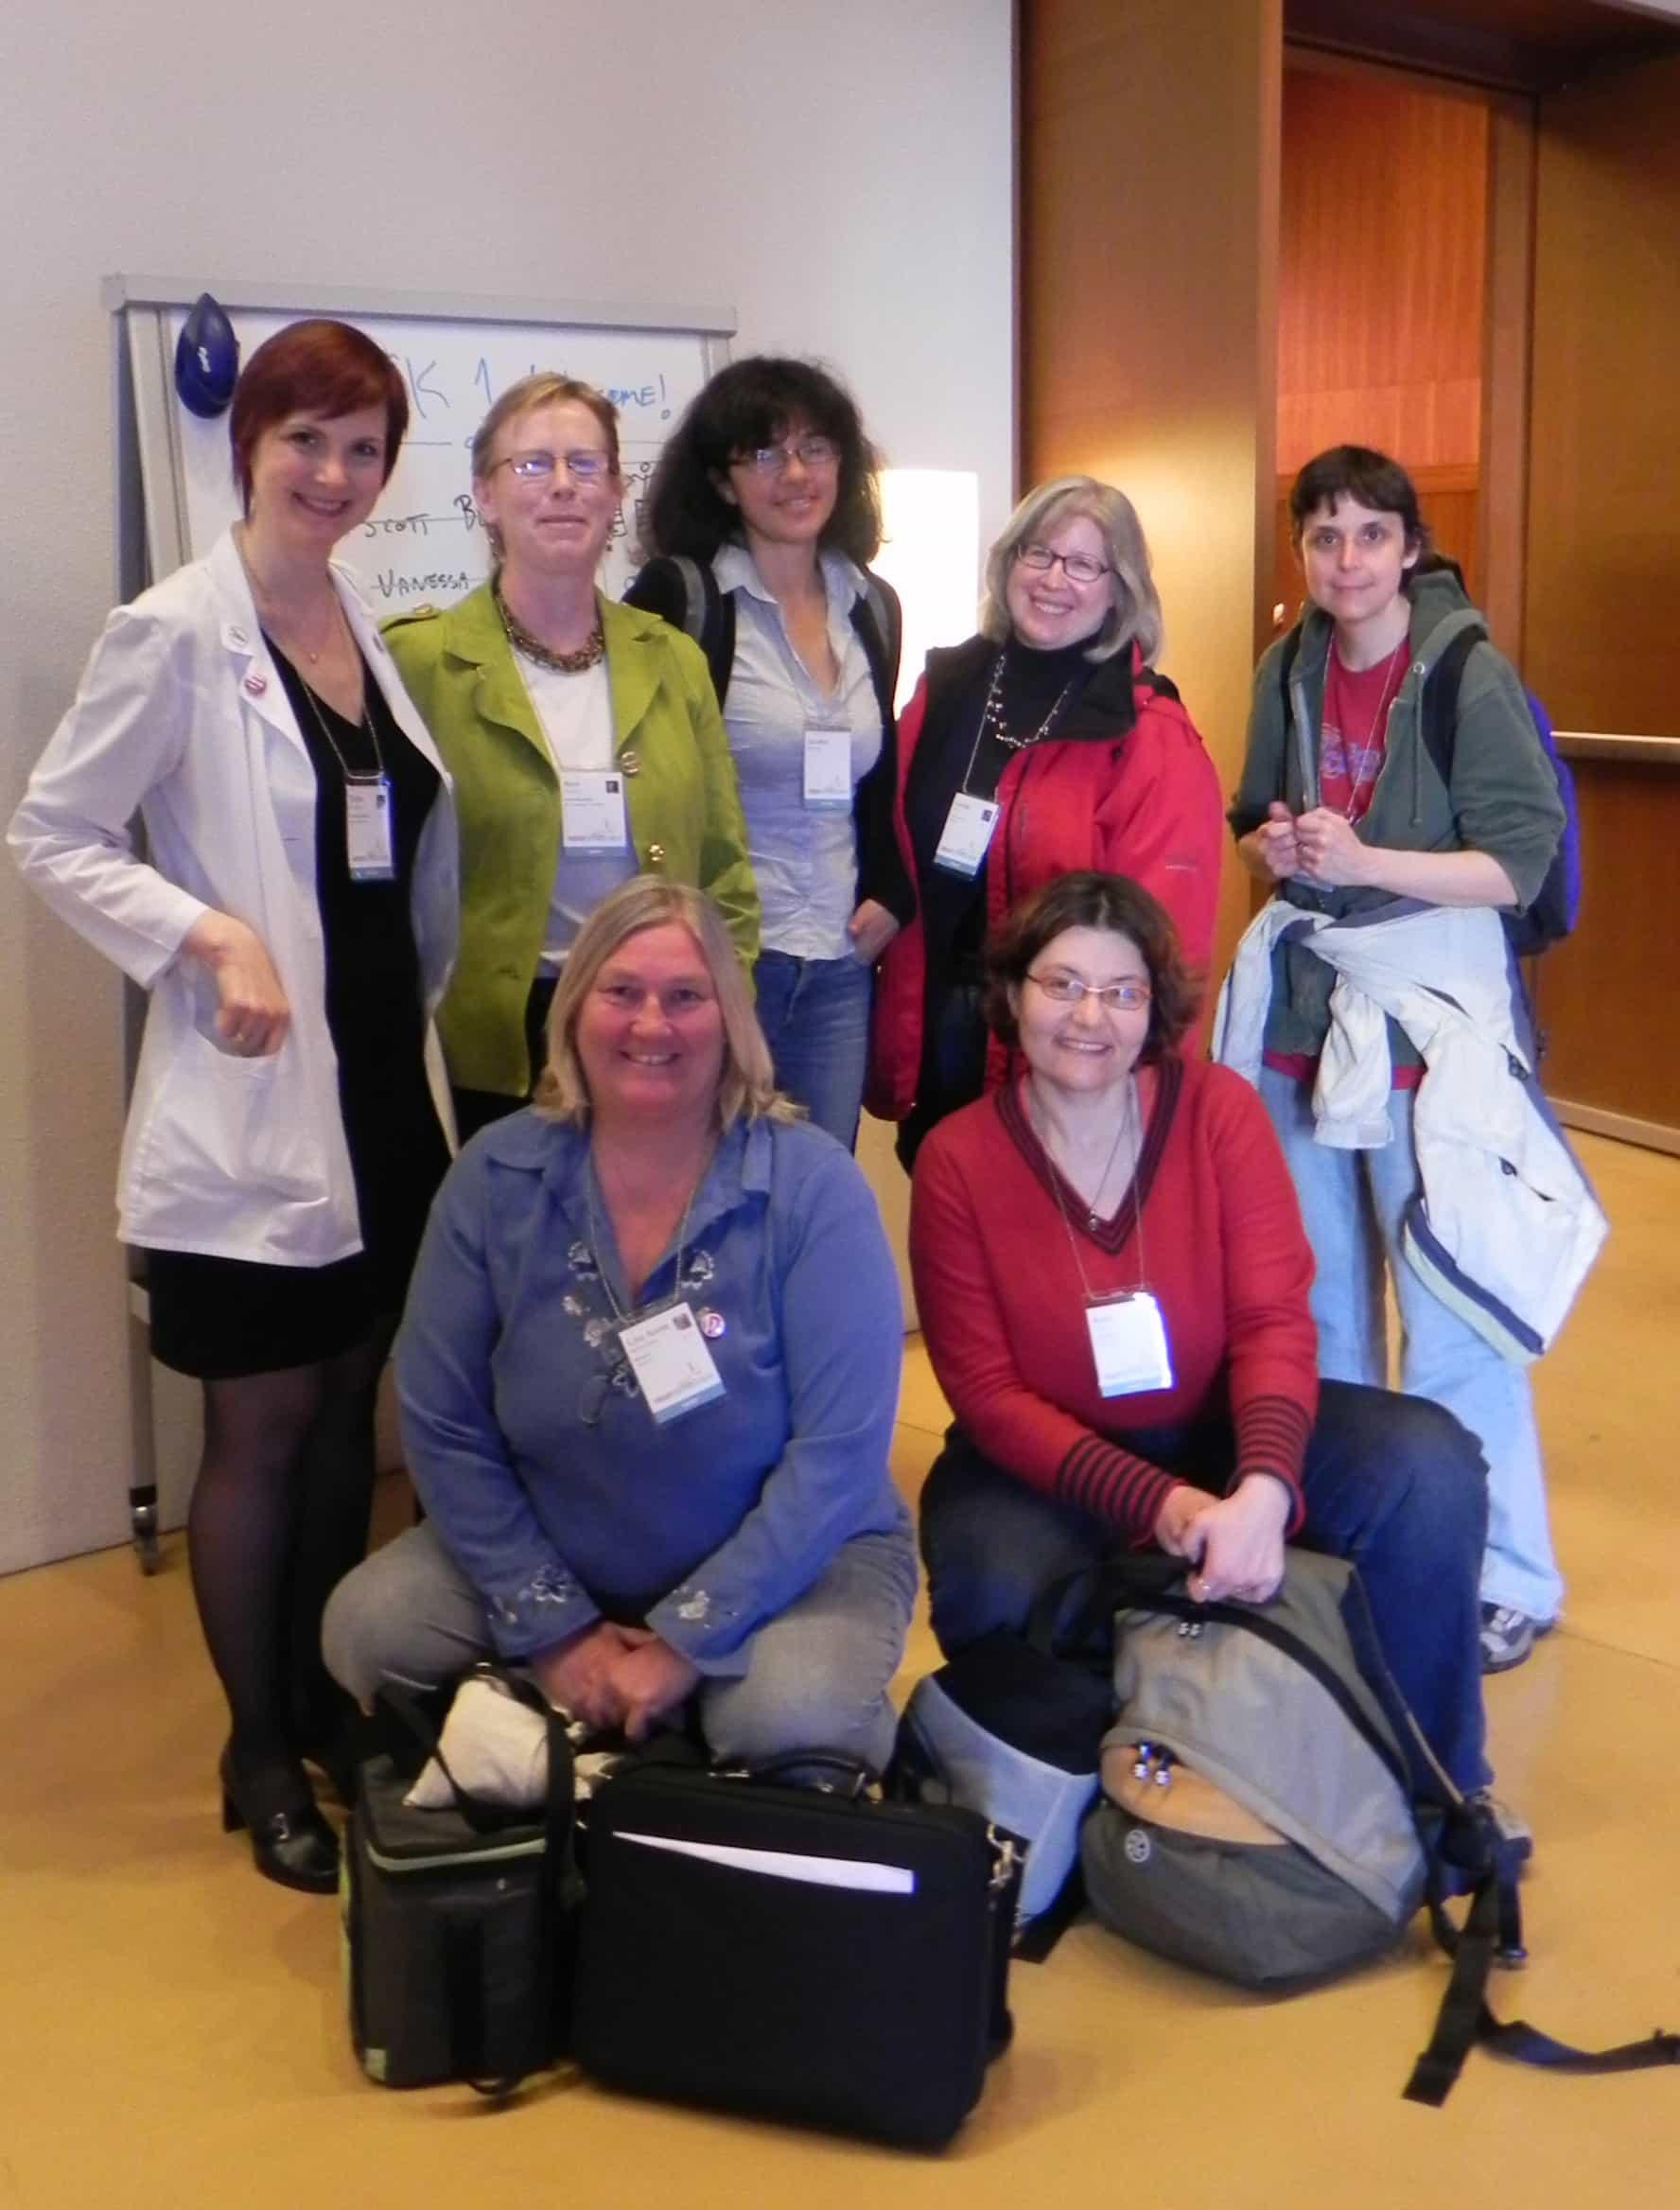 East Bay WordPress Meetup members at WCSF 2010